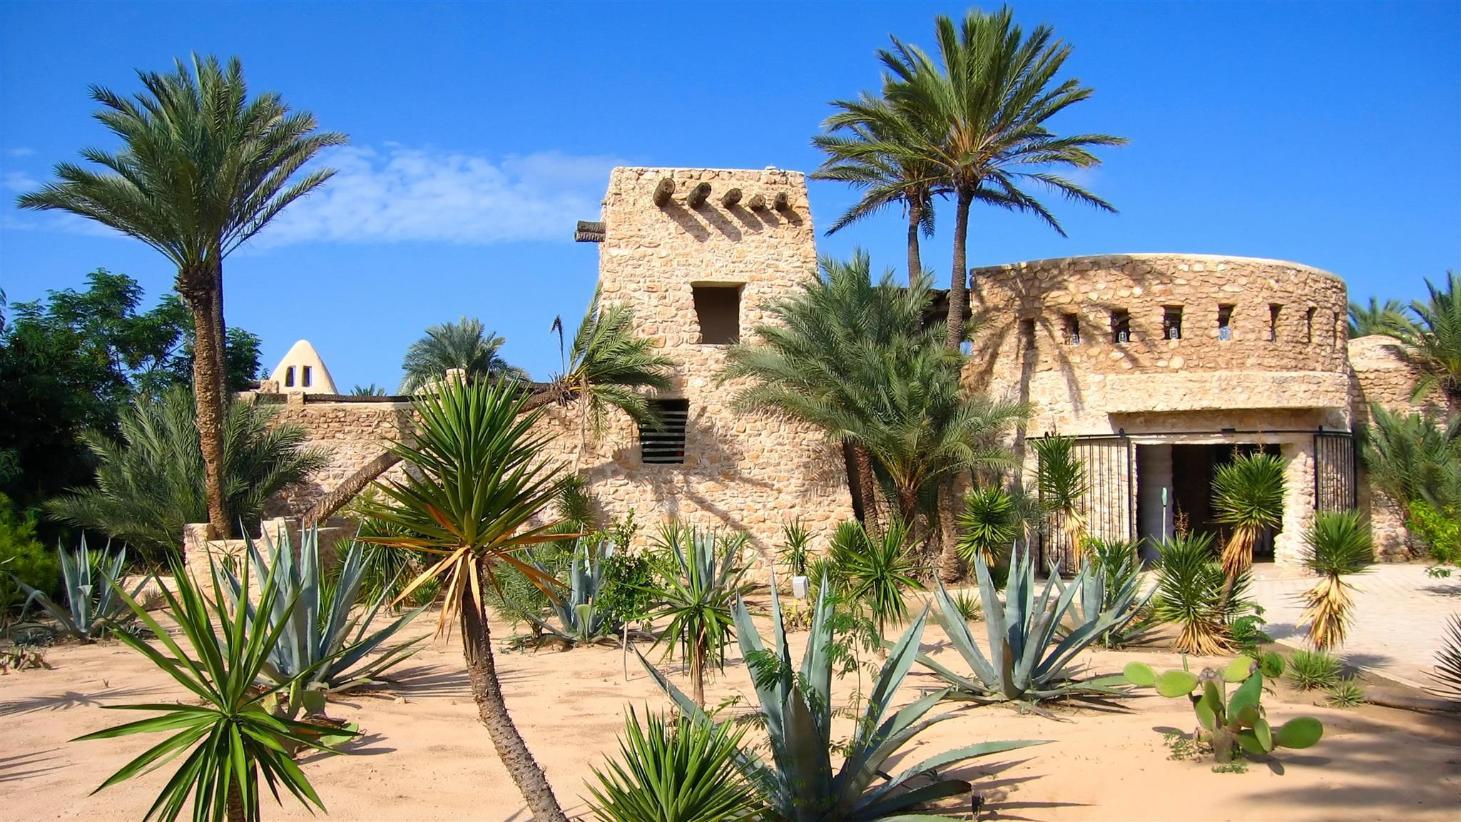 Dating Site Tunisia Djerba